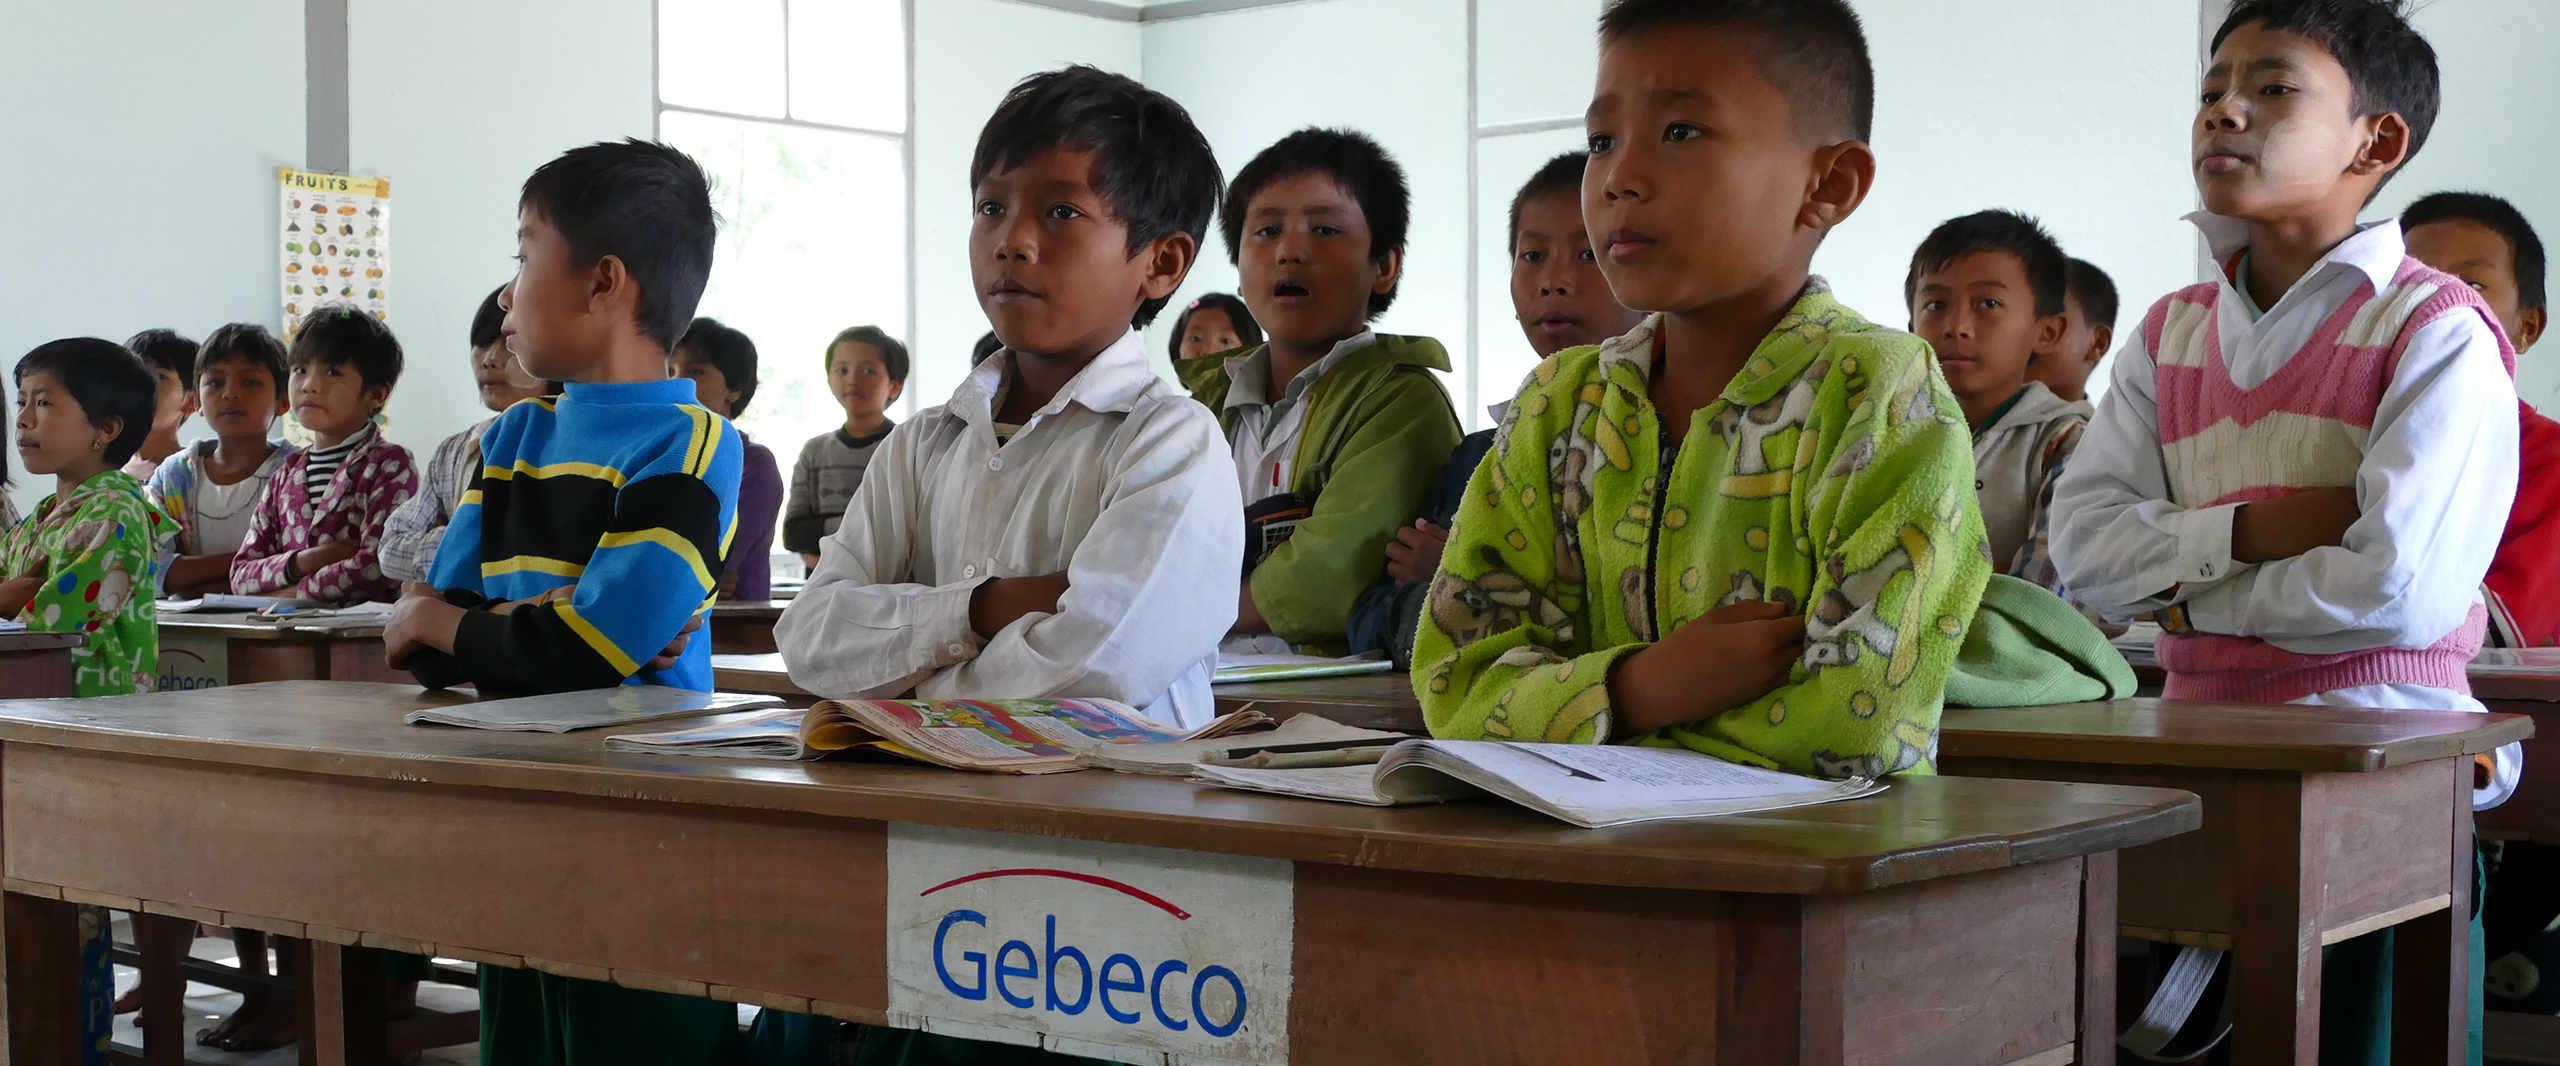 Schueler lernen in ihrer Klasse der Taung Ba Schule in Myanmar